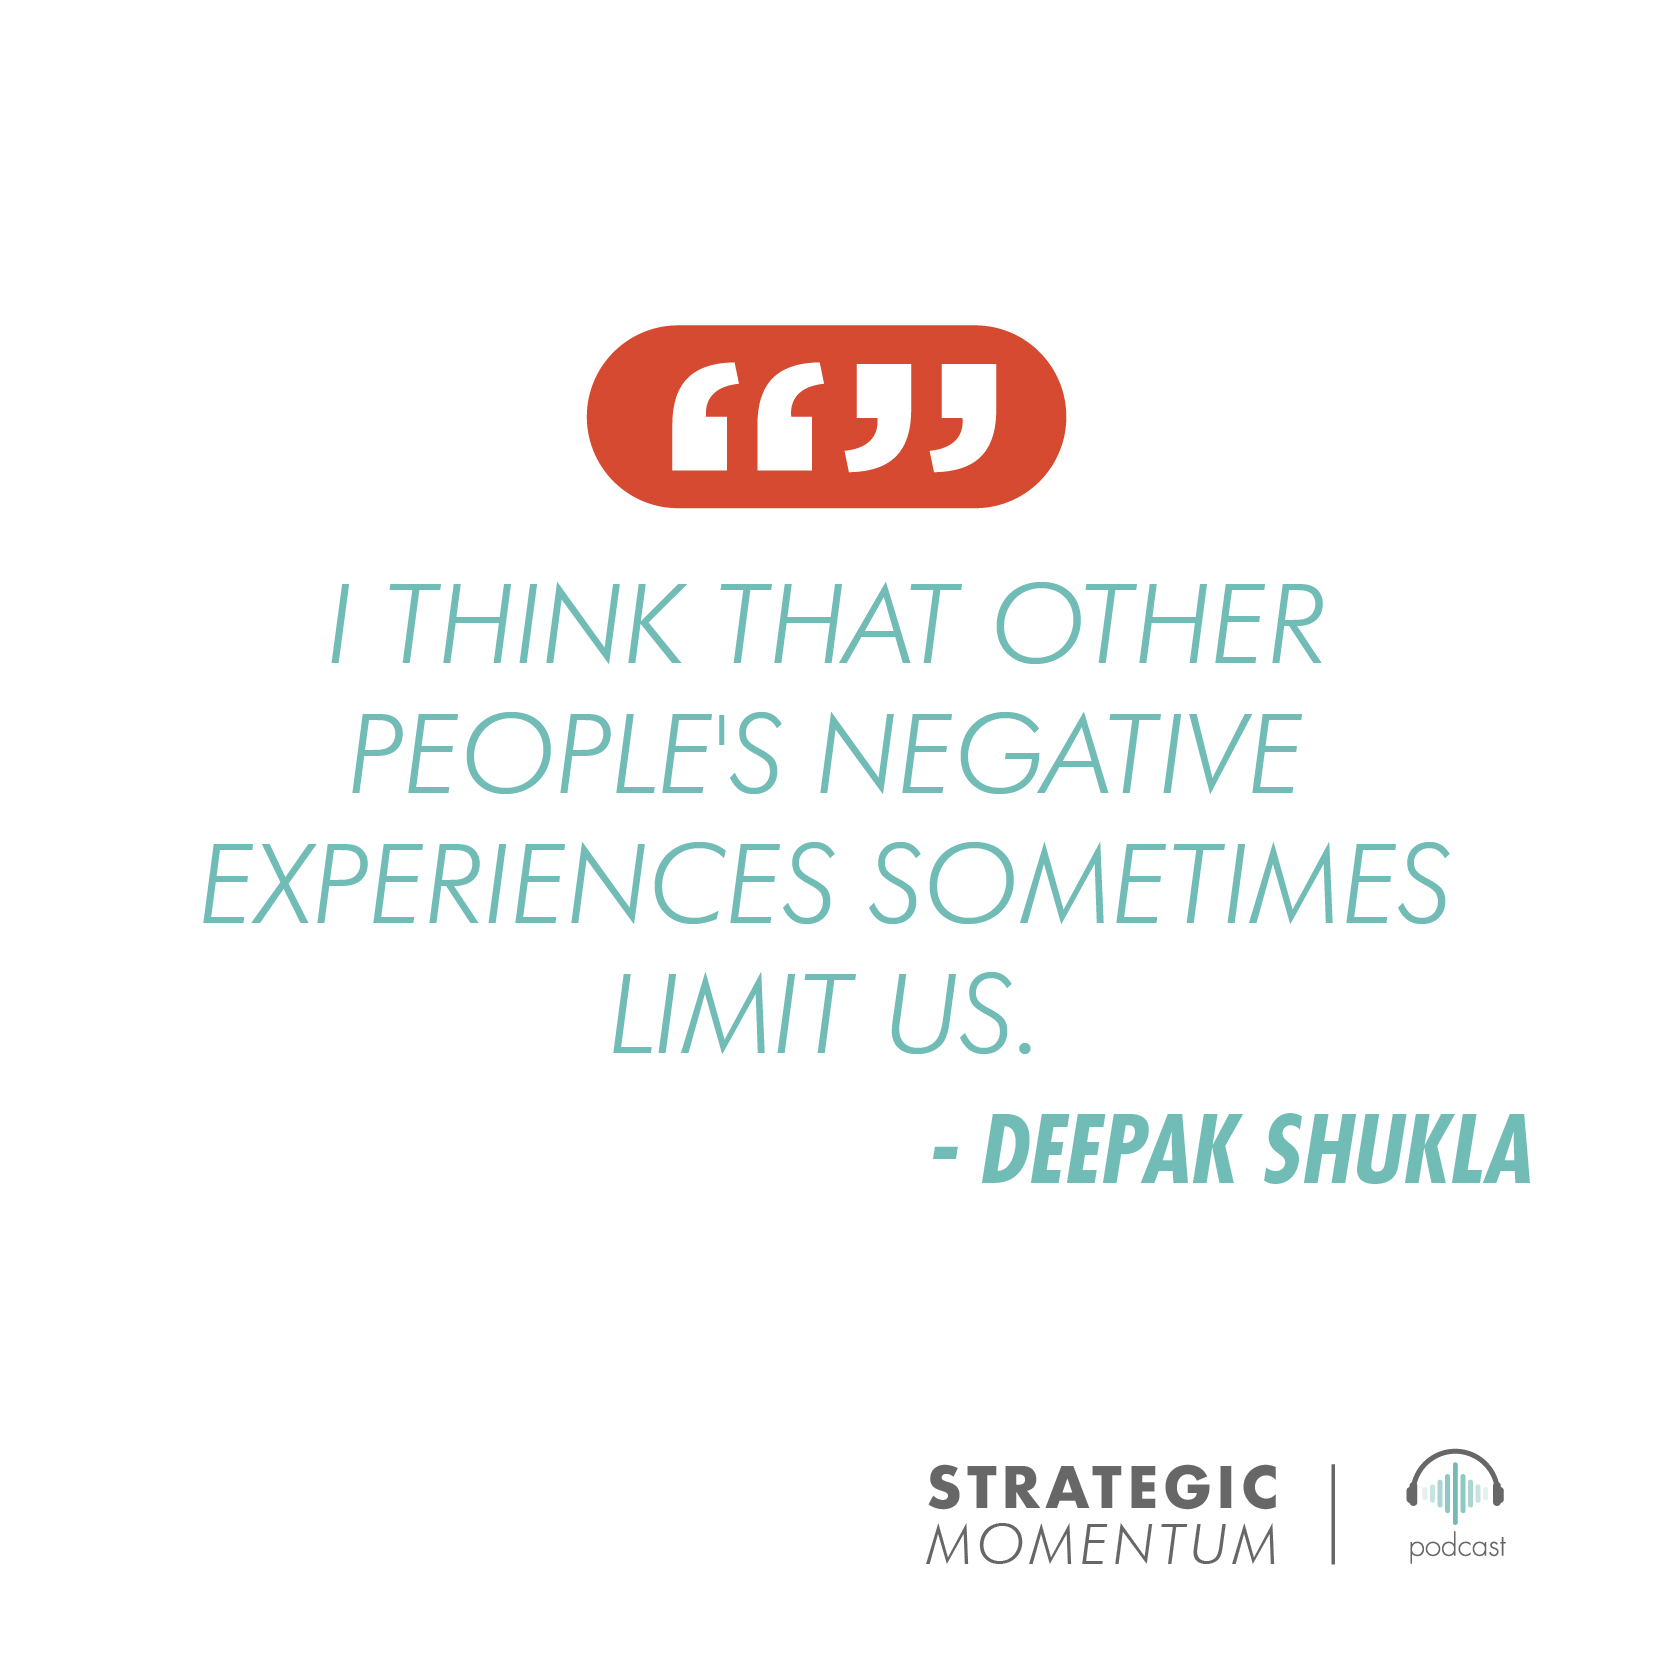 Deepak Shukla Quote | Strategic Momentum Podcast